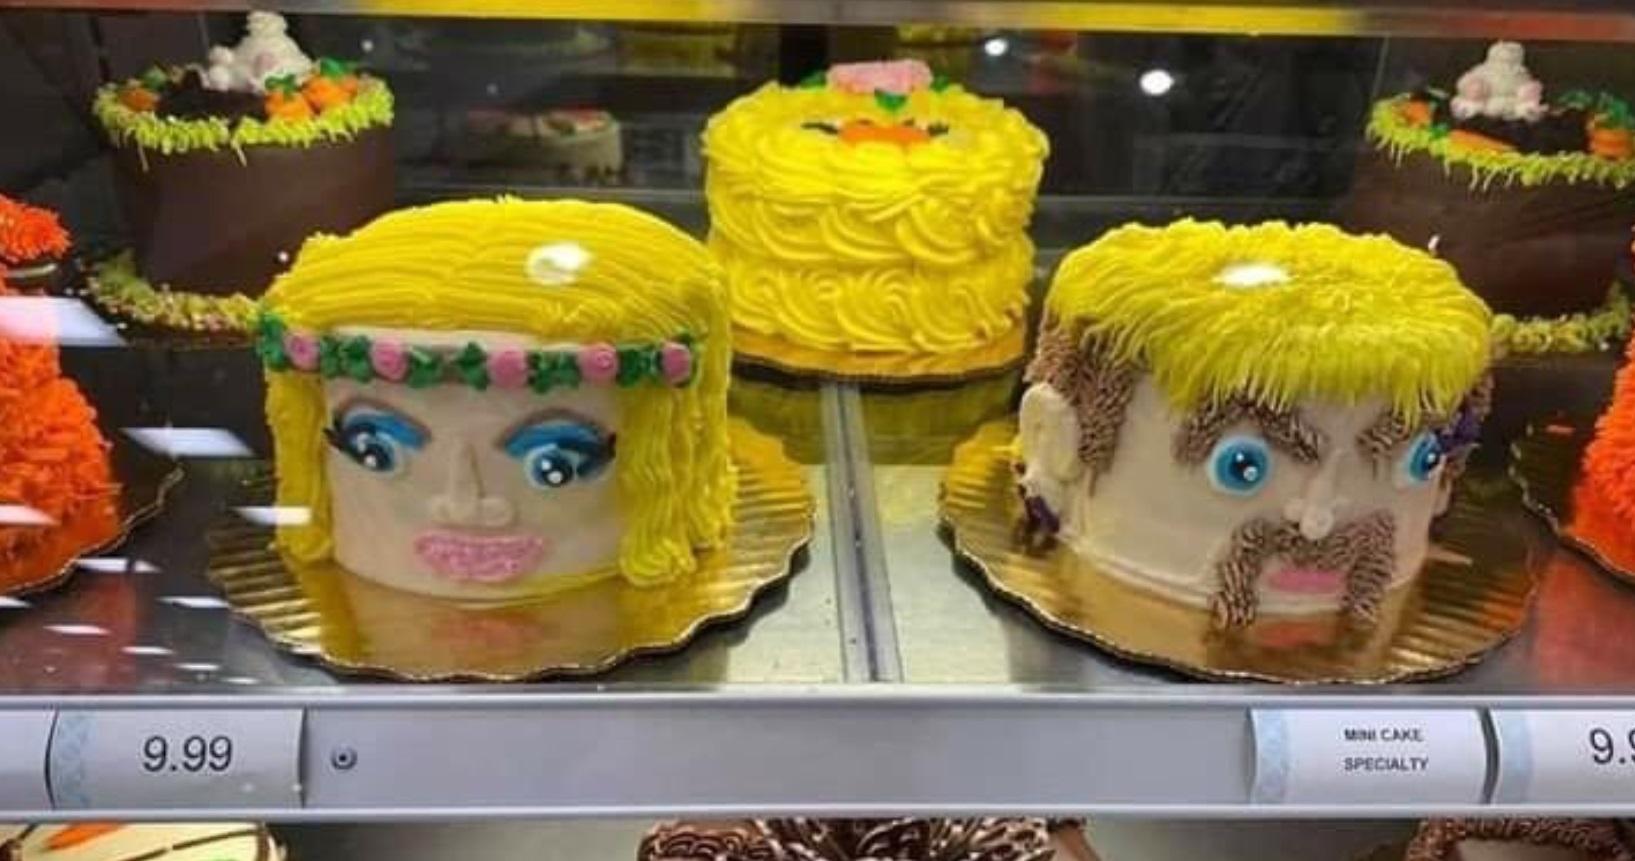 PHOTO Joe Exotic Carole Baskin Face Cake